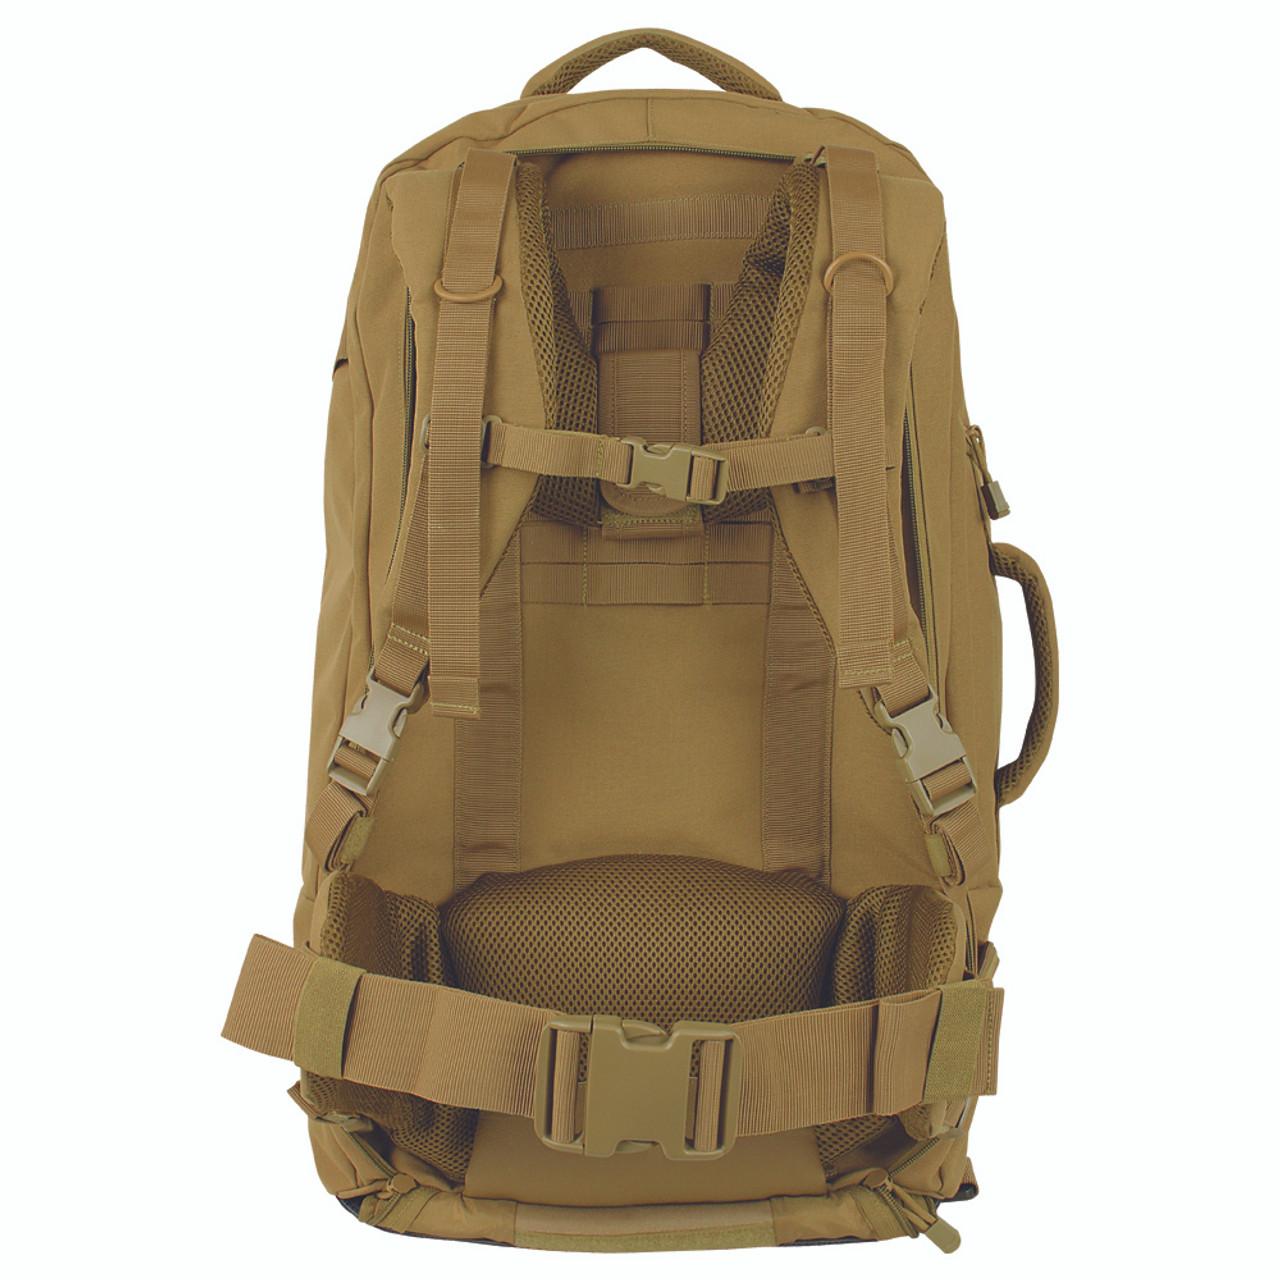 Condor Trekker Pack Atlantic Tactical Inc